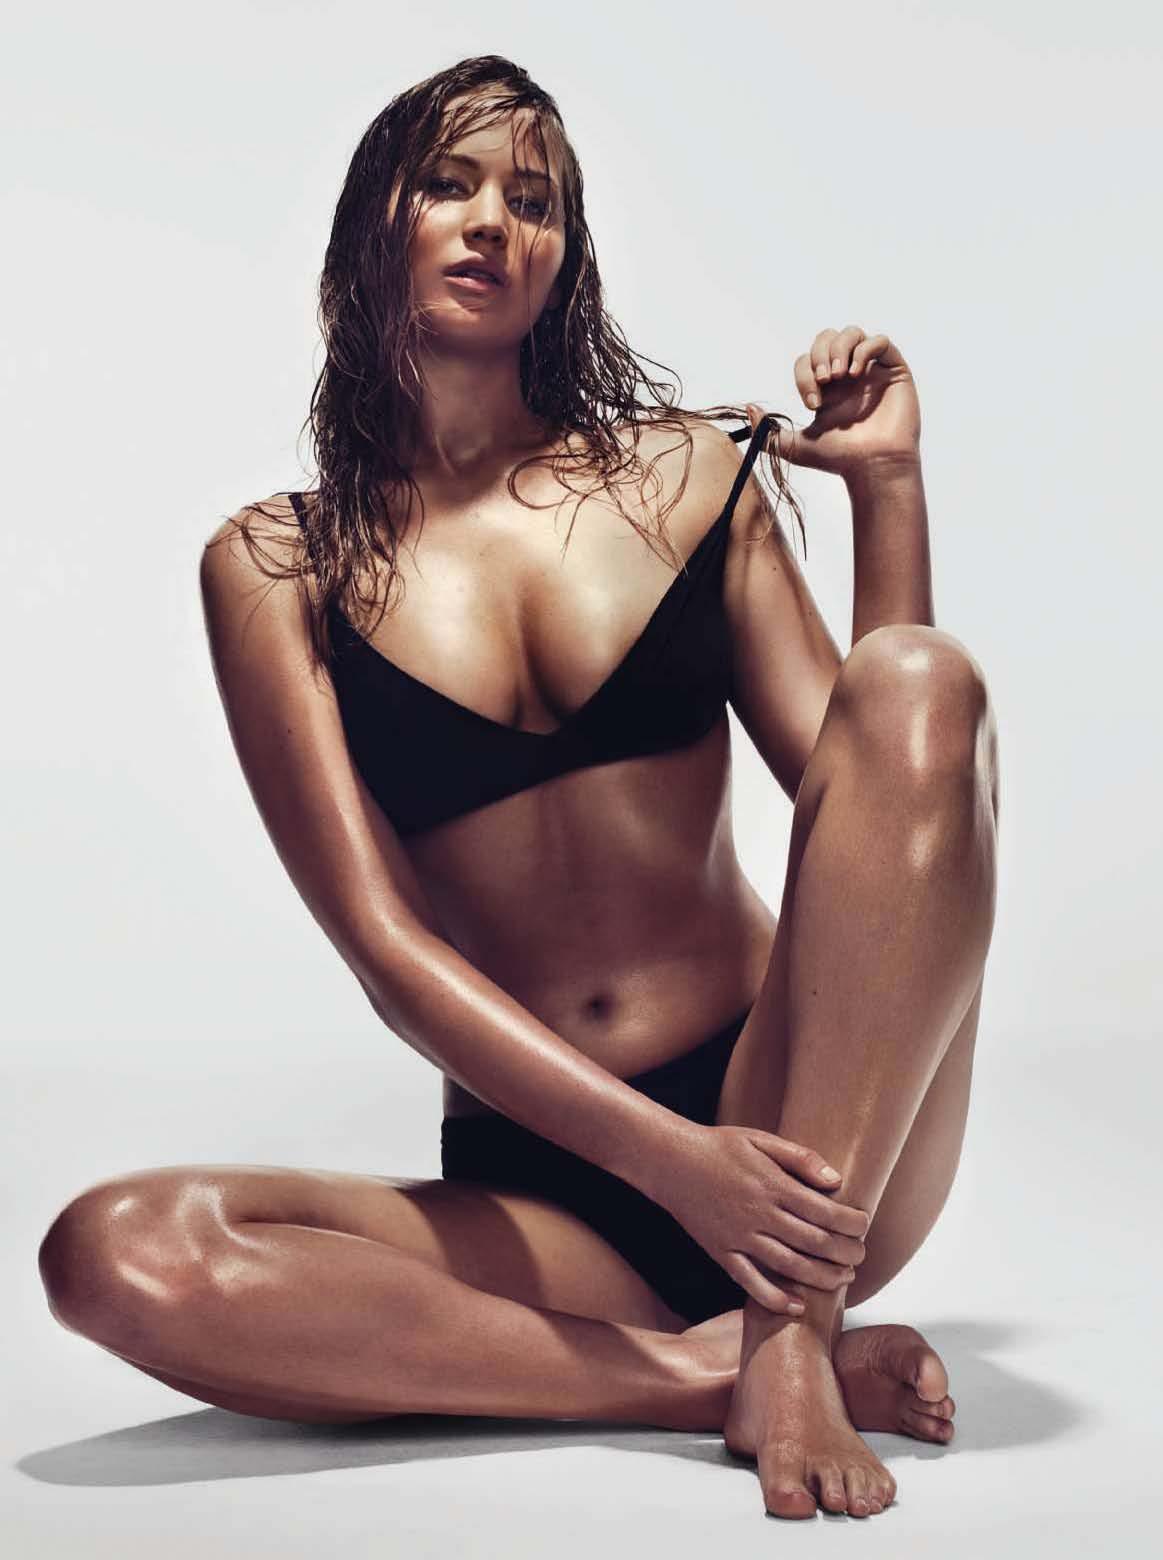 jennifer-lawrence-bikini-17a9b.jpg (1163×1560)